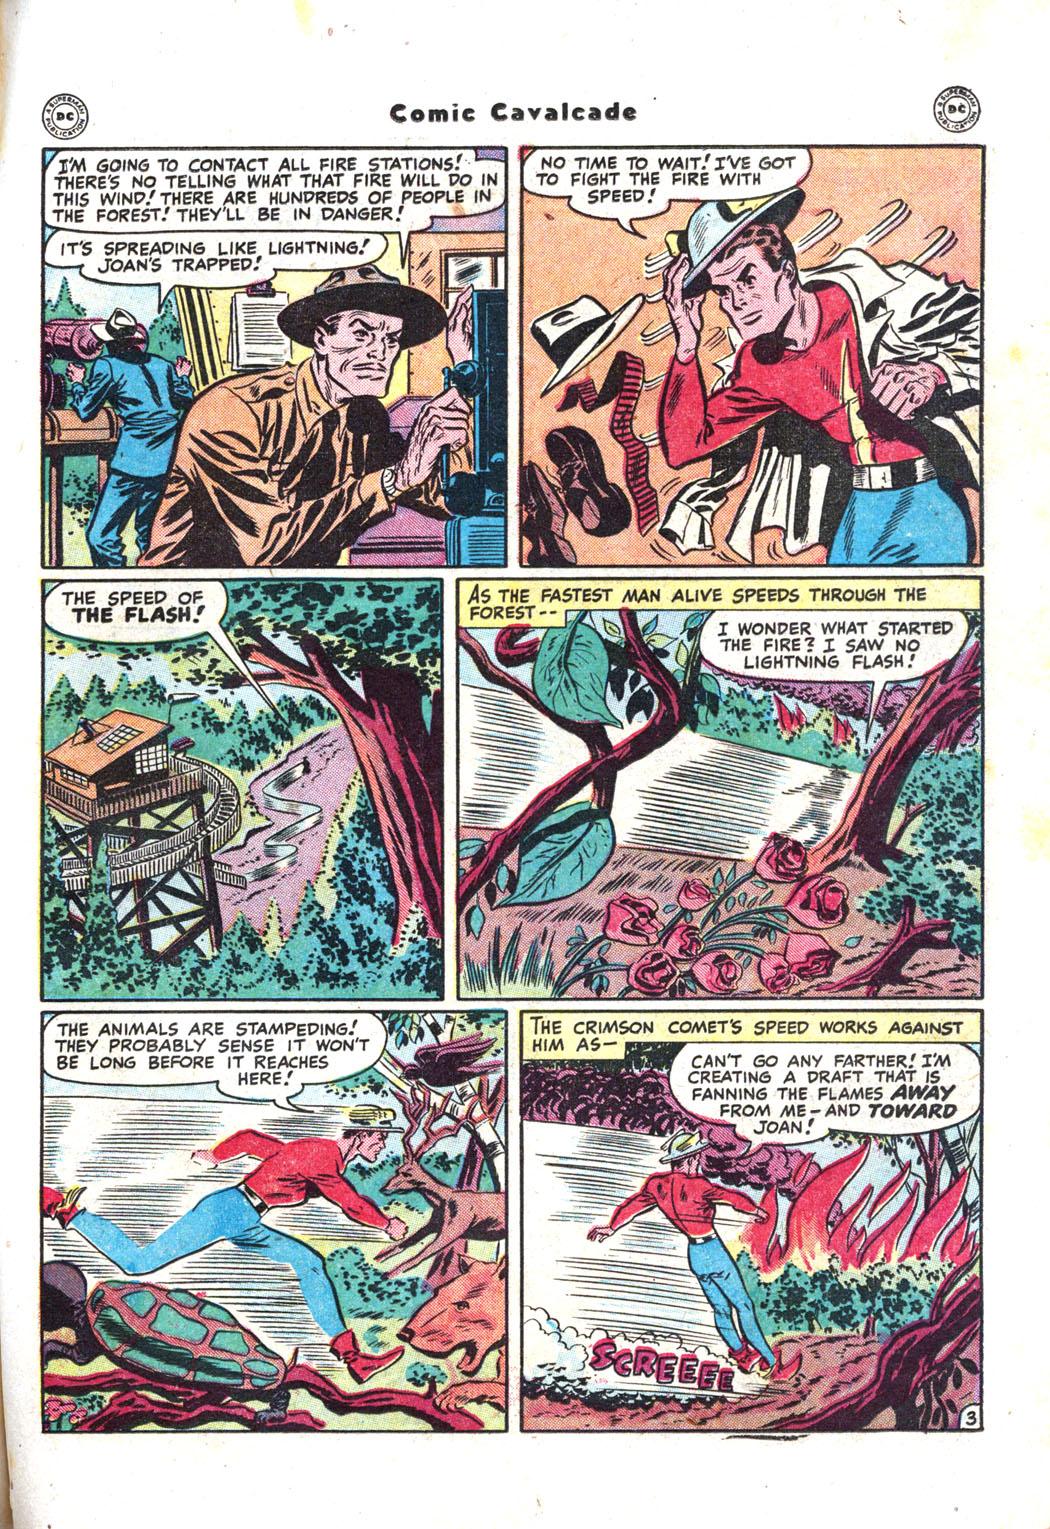 Comic Cavalcade issue 26 - Page 63